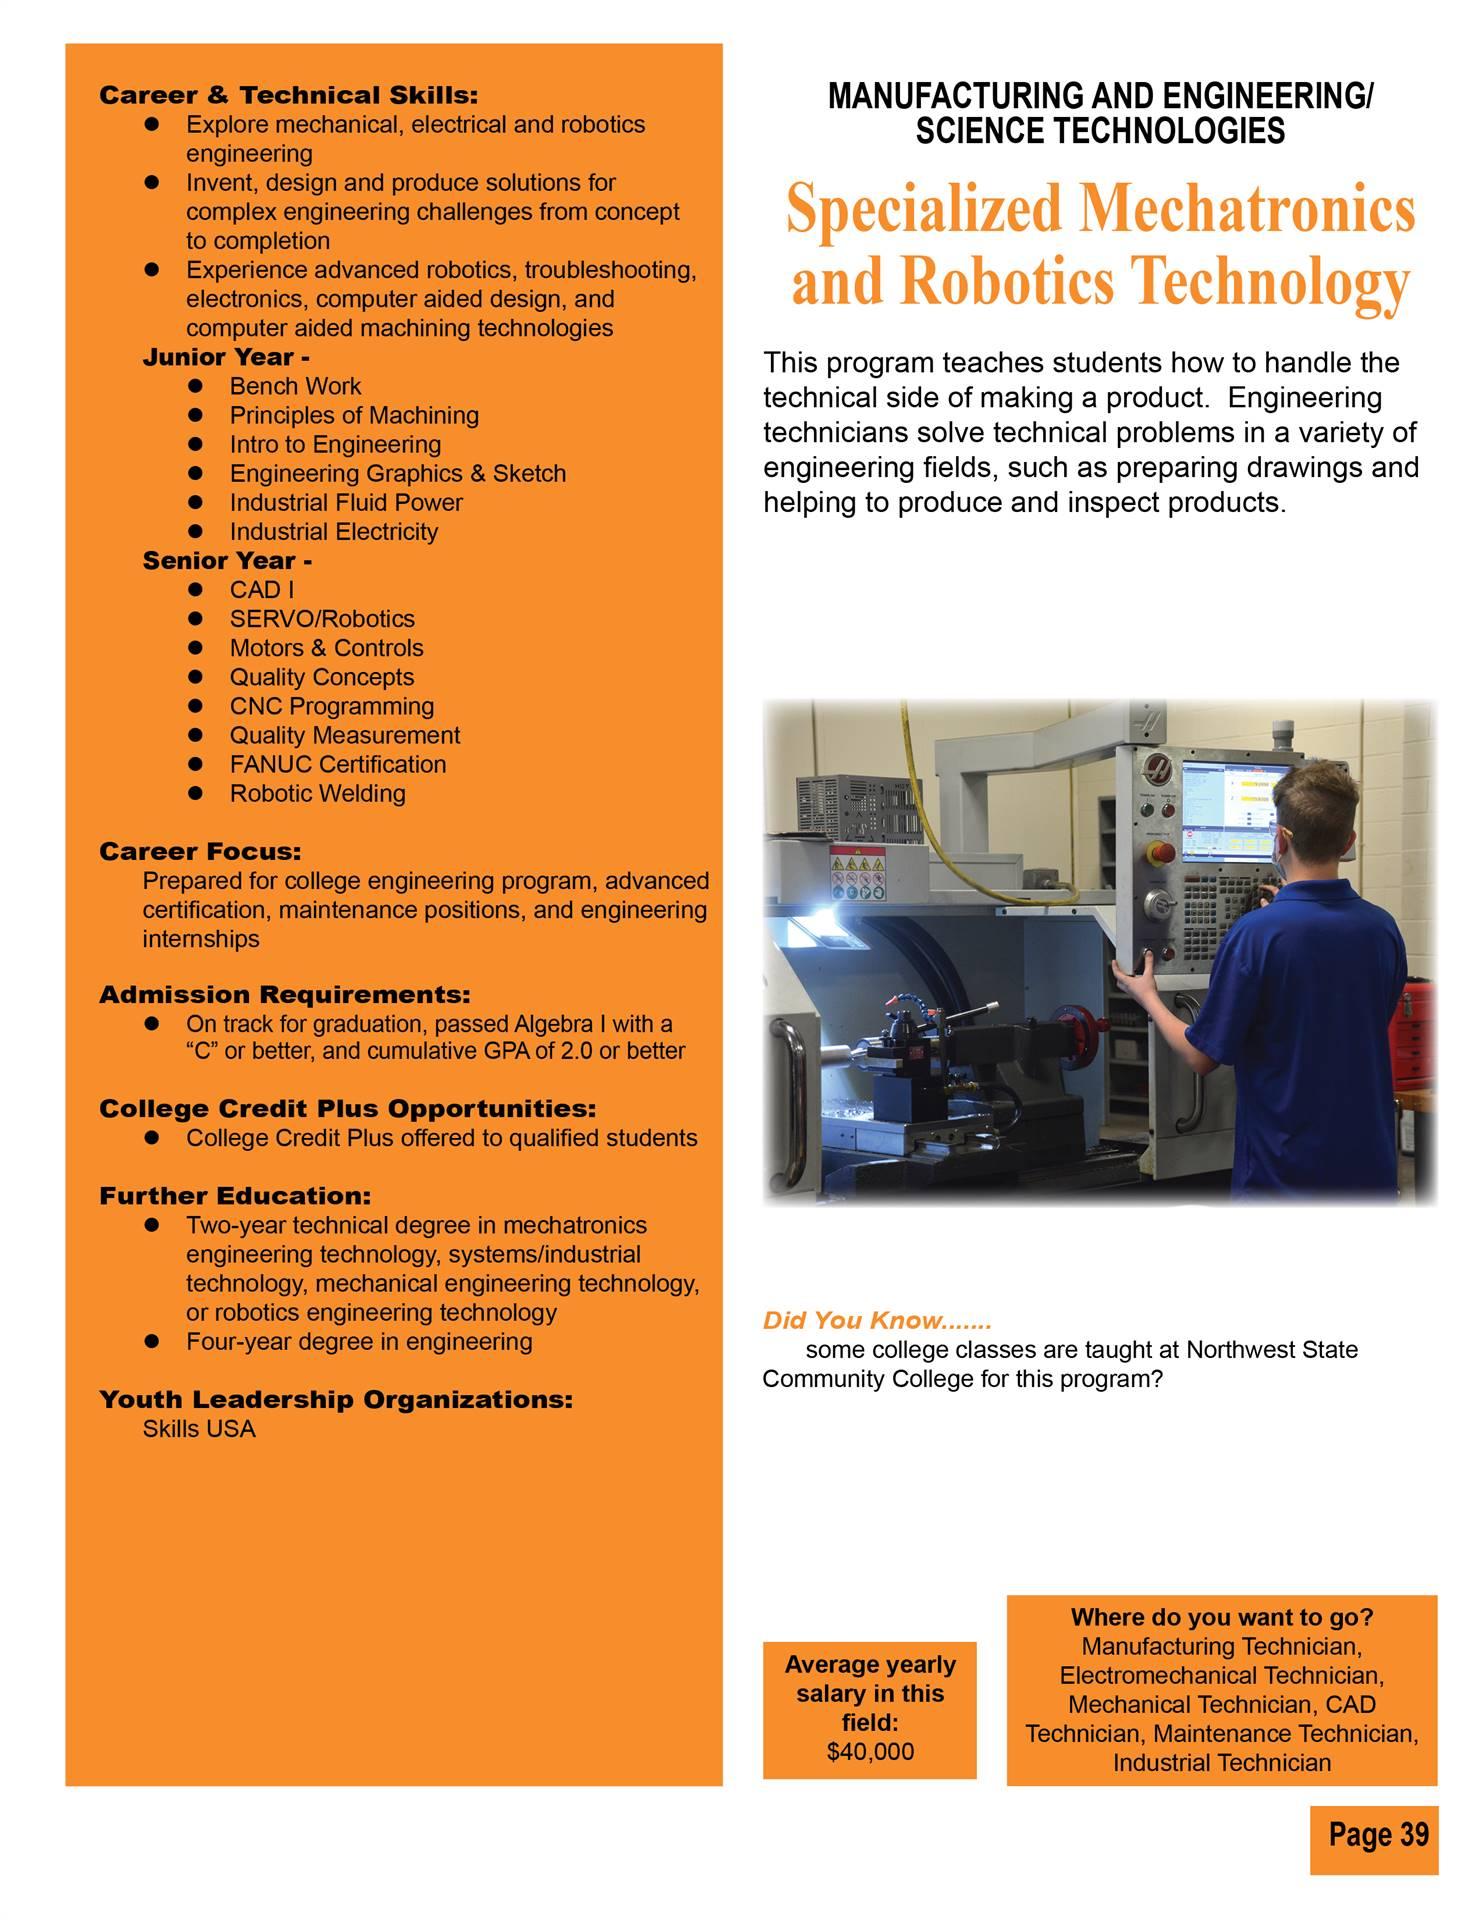 Specialized Mechatronics & Robotics Technology